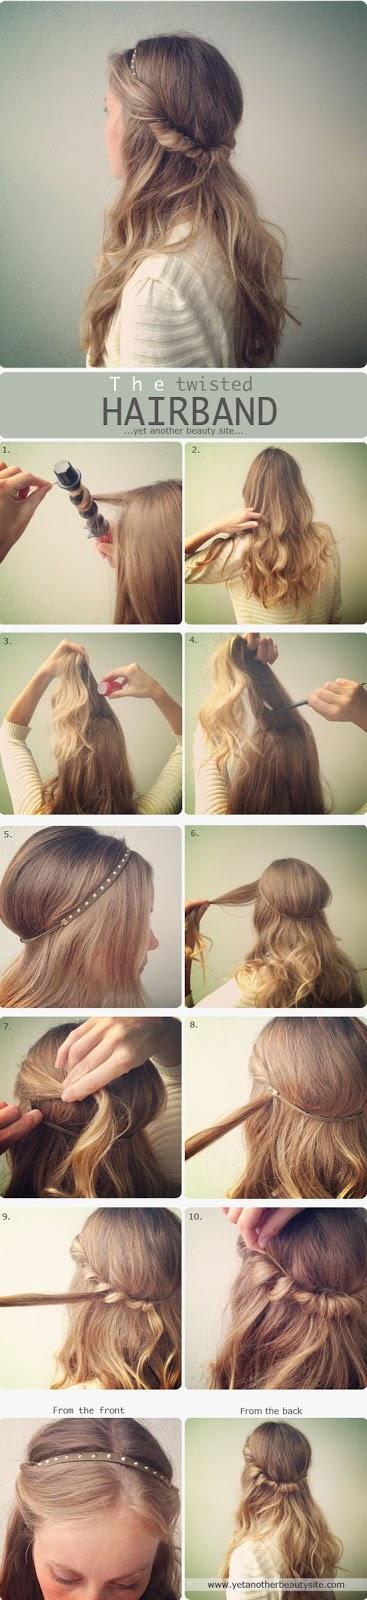 peinado facil con ondas y diadema